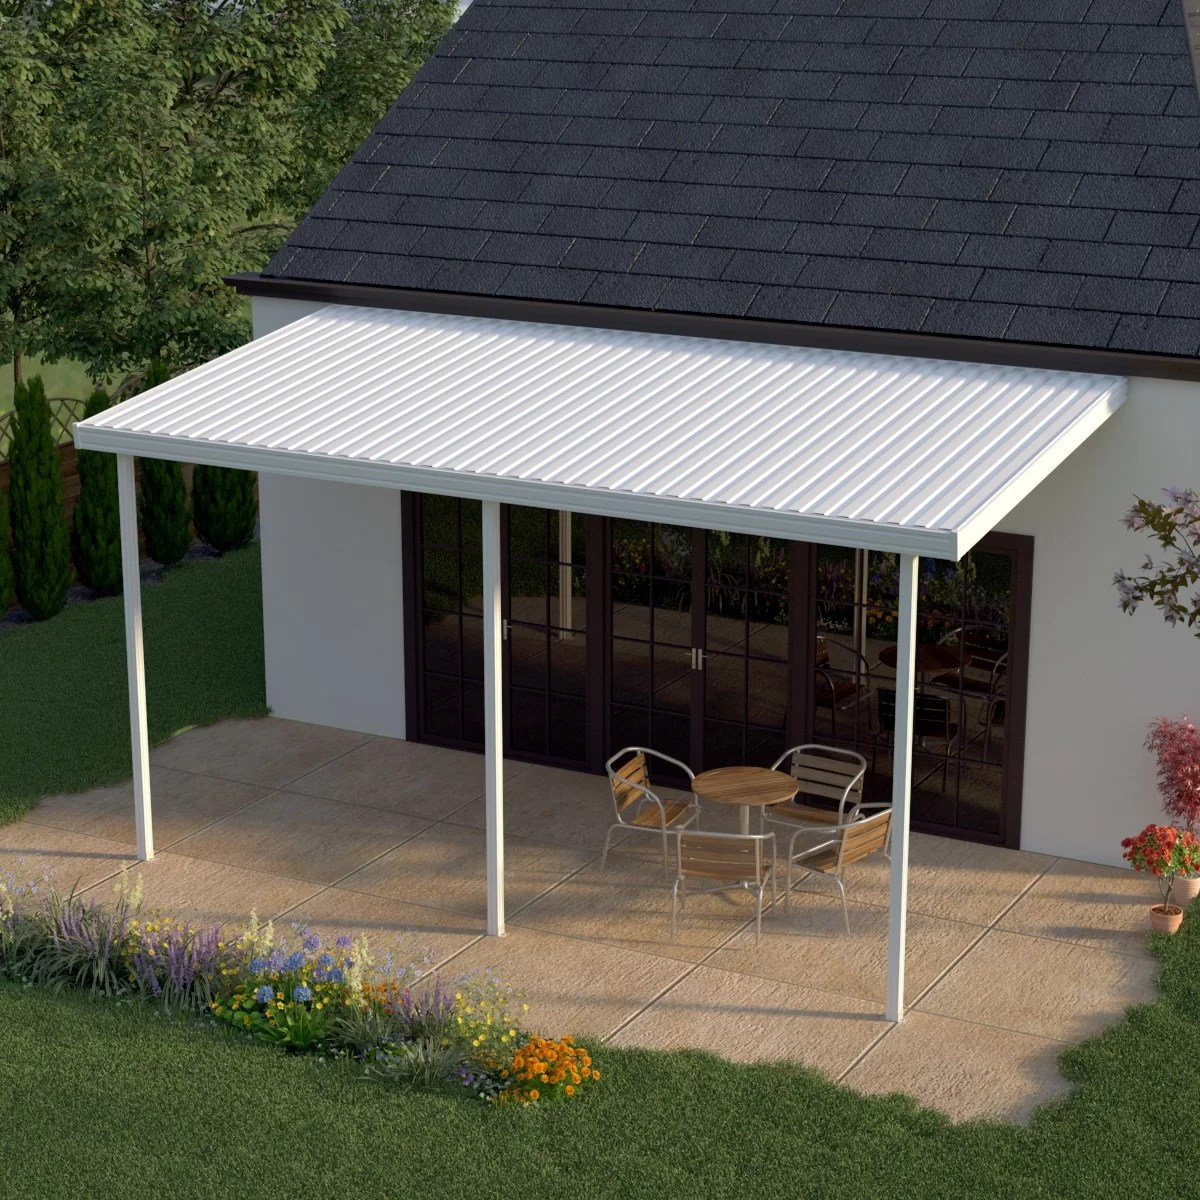 16 ft w x 8 ft d metal standard patio awning